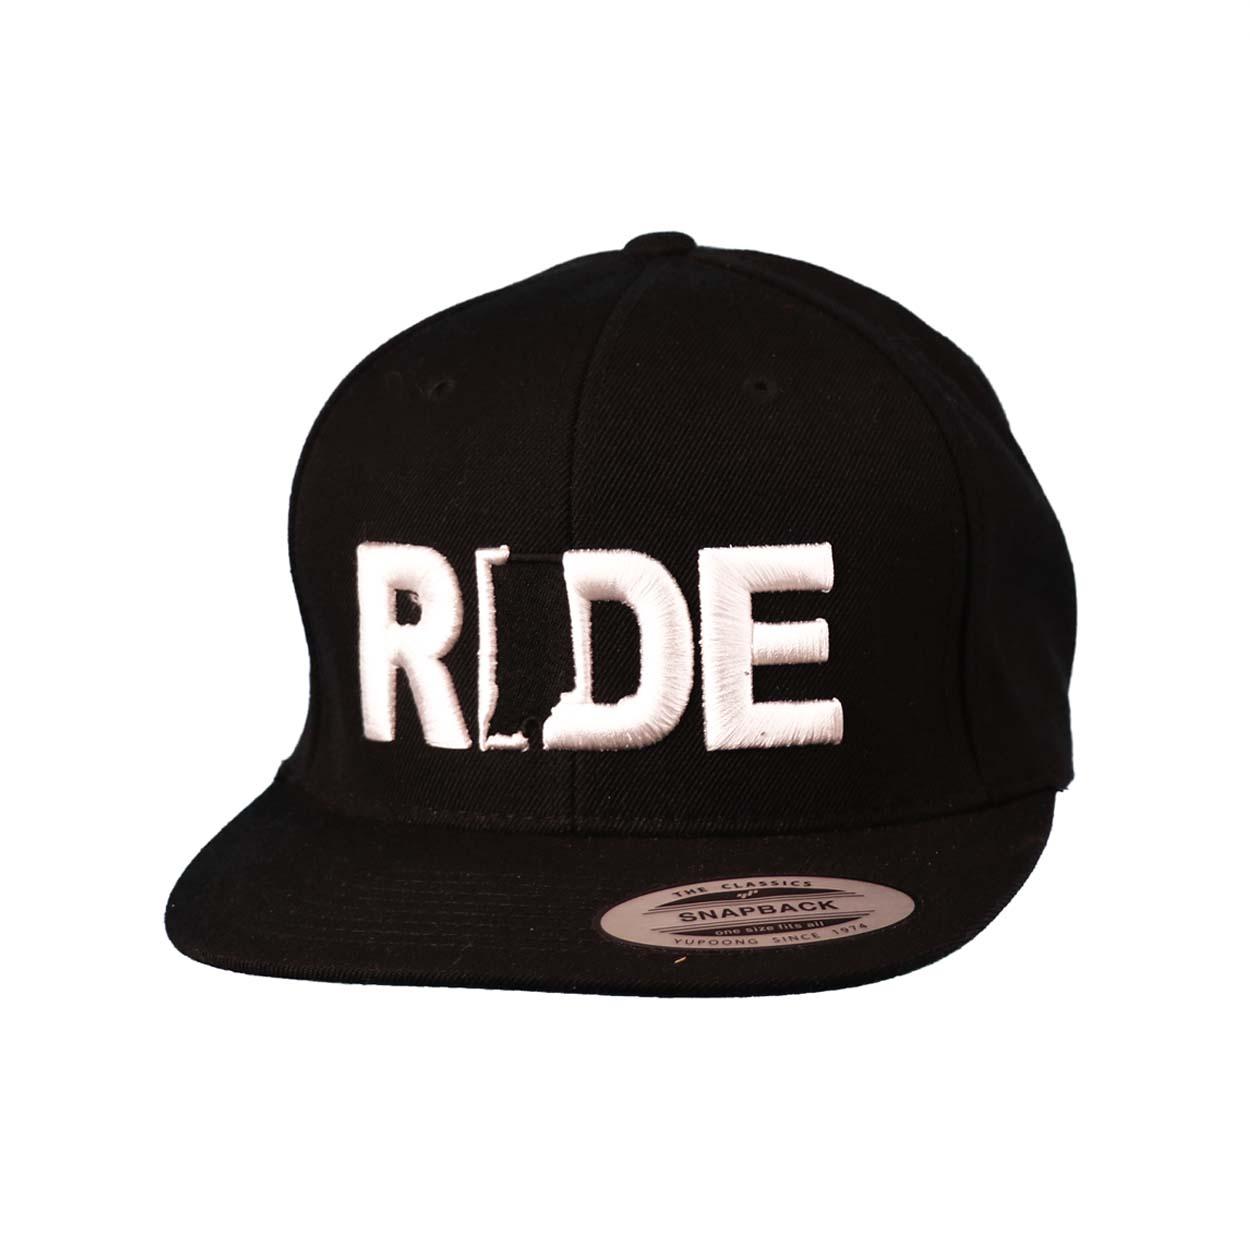 Ride Indiana Classic Embroidered  Snapback Flat Brim Hat Black/White